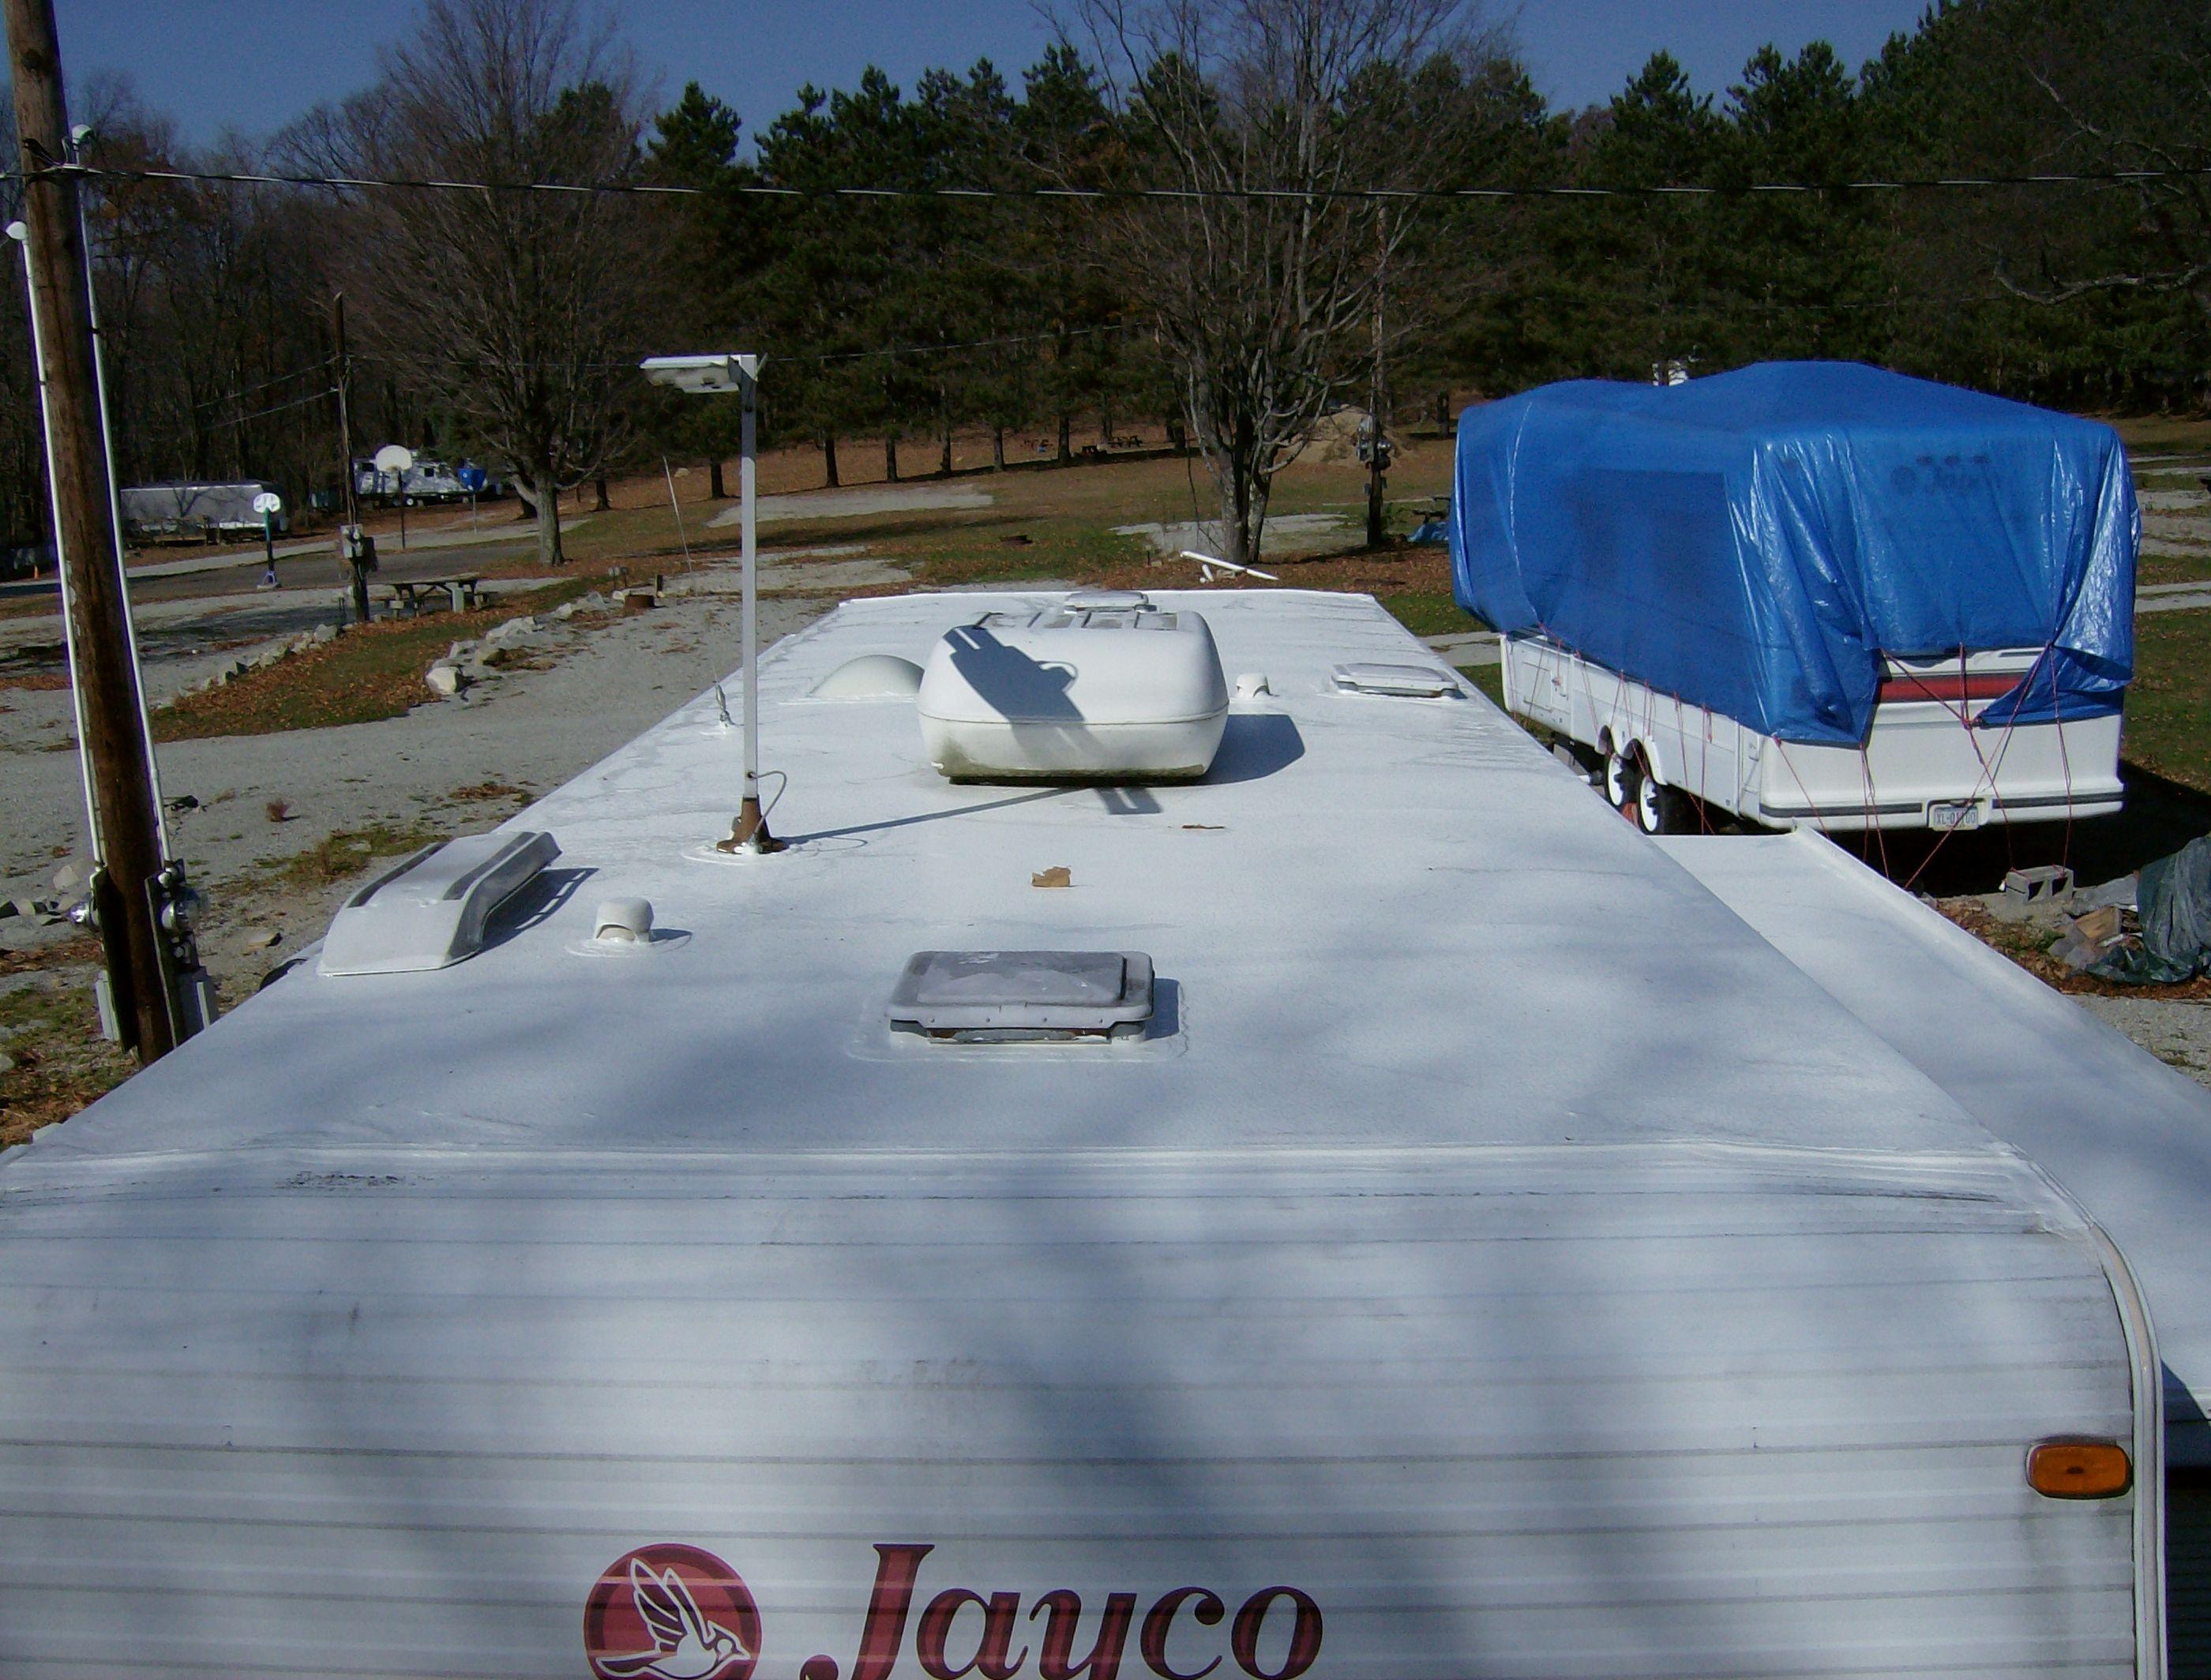 Picuter Before Applying Epdm Coatings Http Www Epdmcoatings Com Rv Roof Repair Html Roof Repair Rv Roof Repair Cool Roof